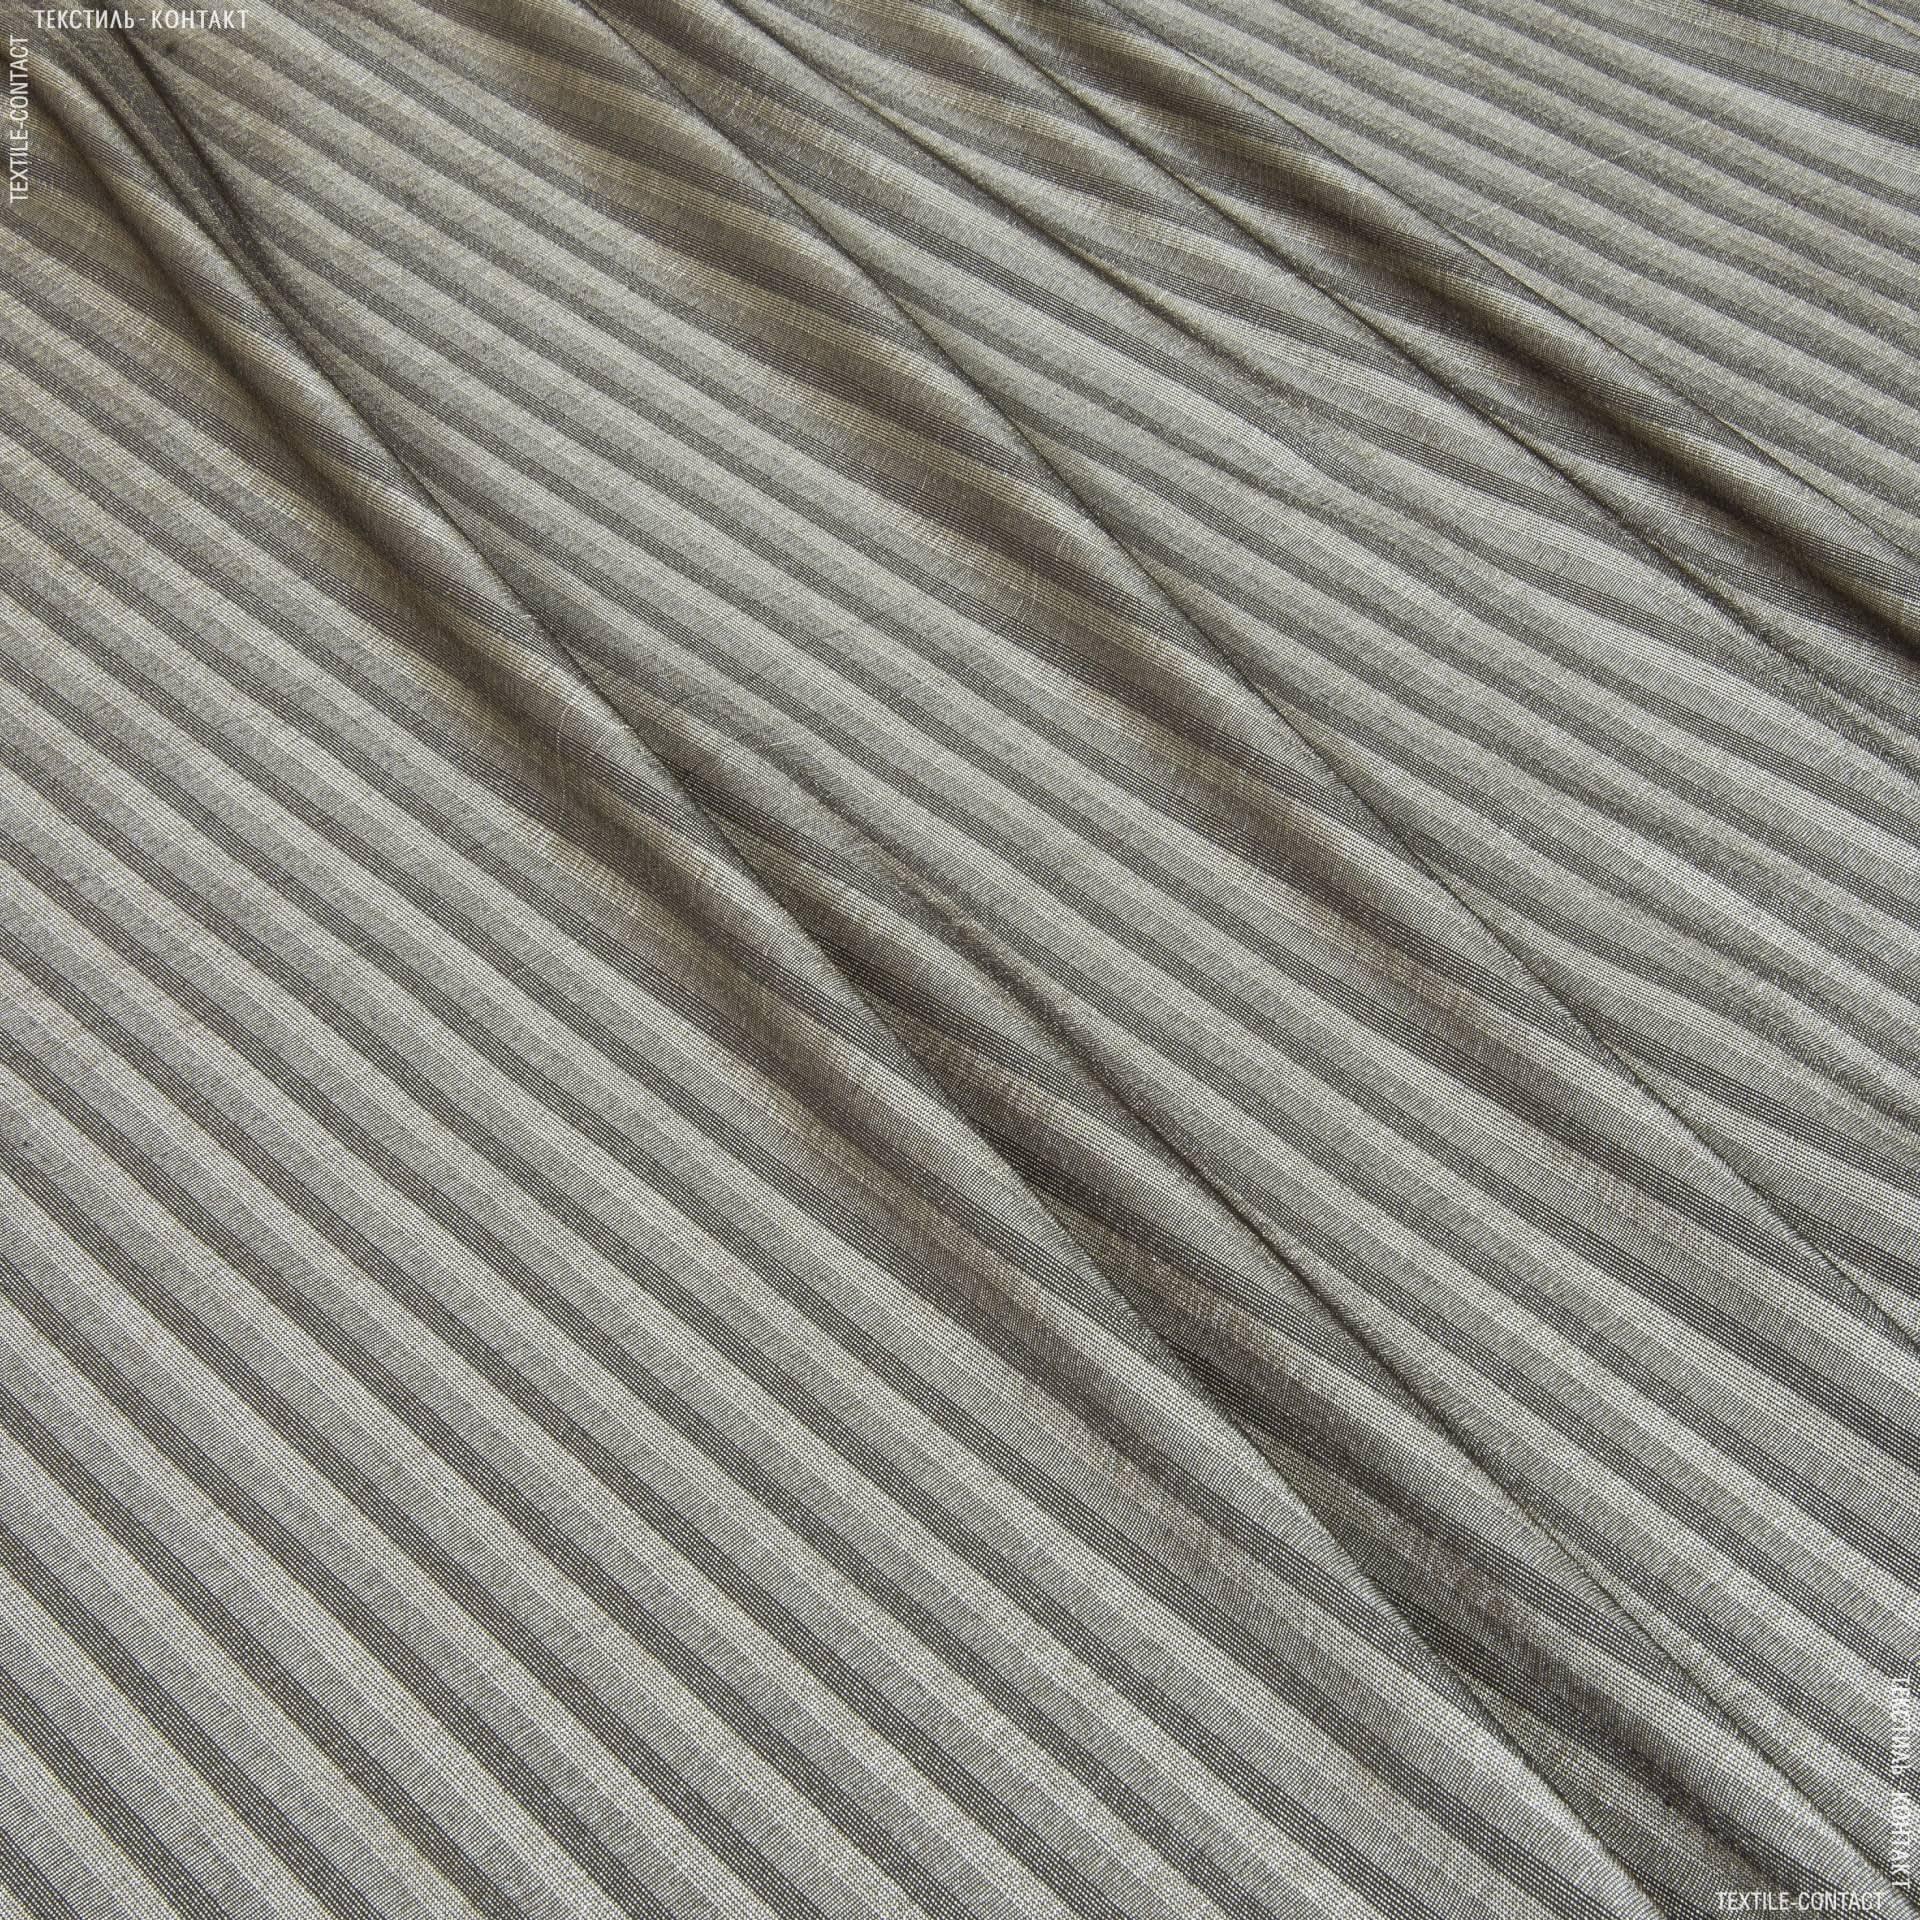 Тканини для суконь - Сорочкова стрейч з люрексом бежево-коричневий